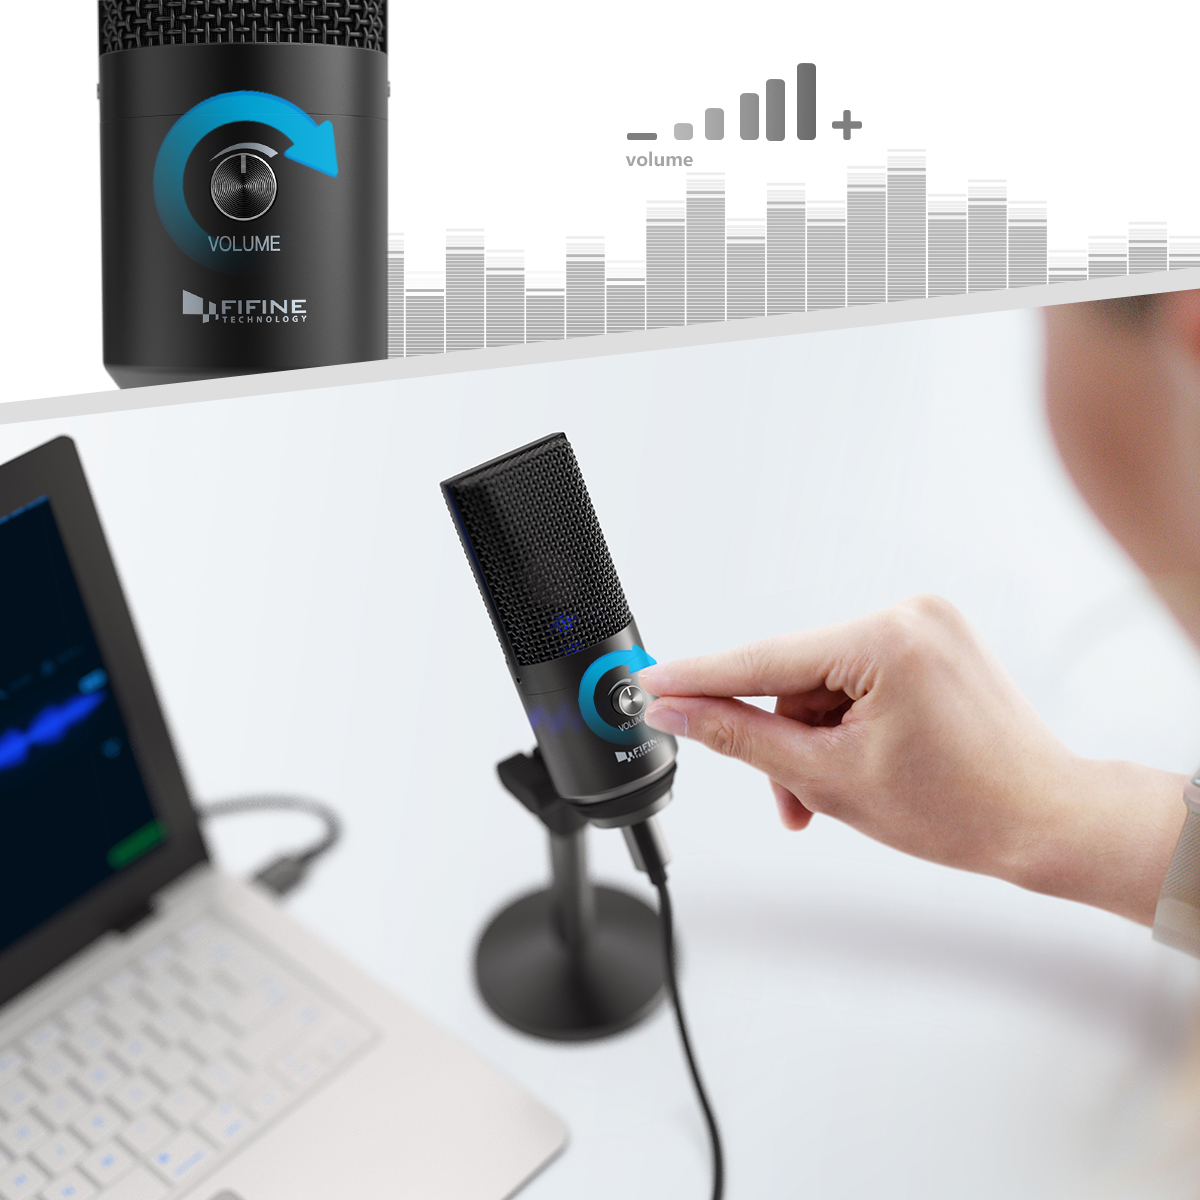 FIFINE Uni-Directional USB Microphone 3